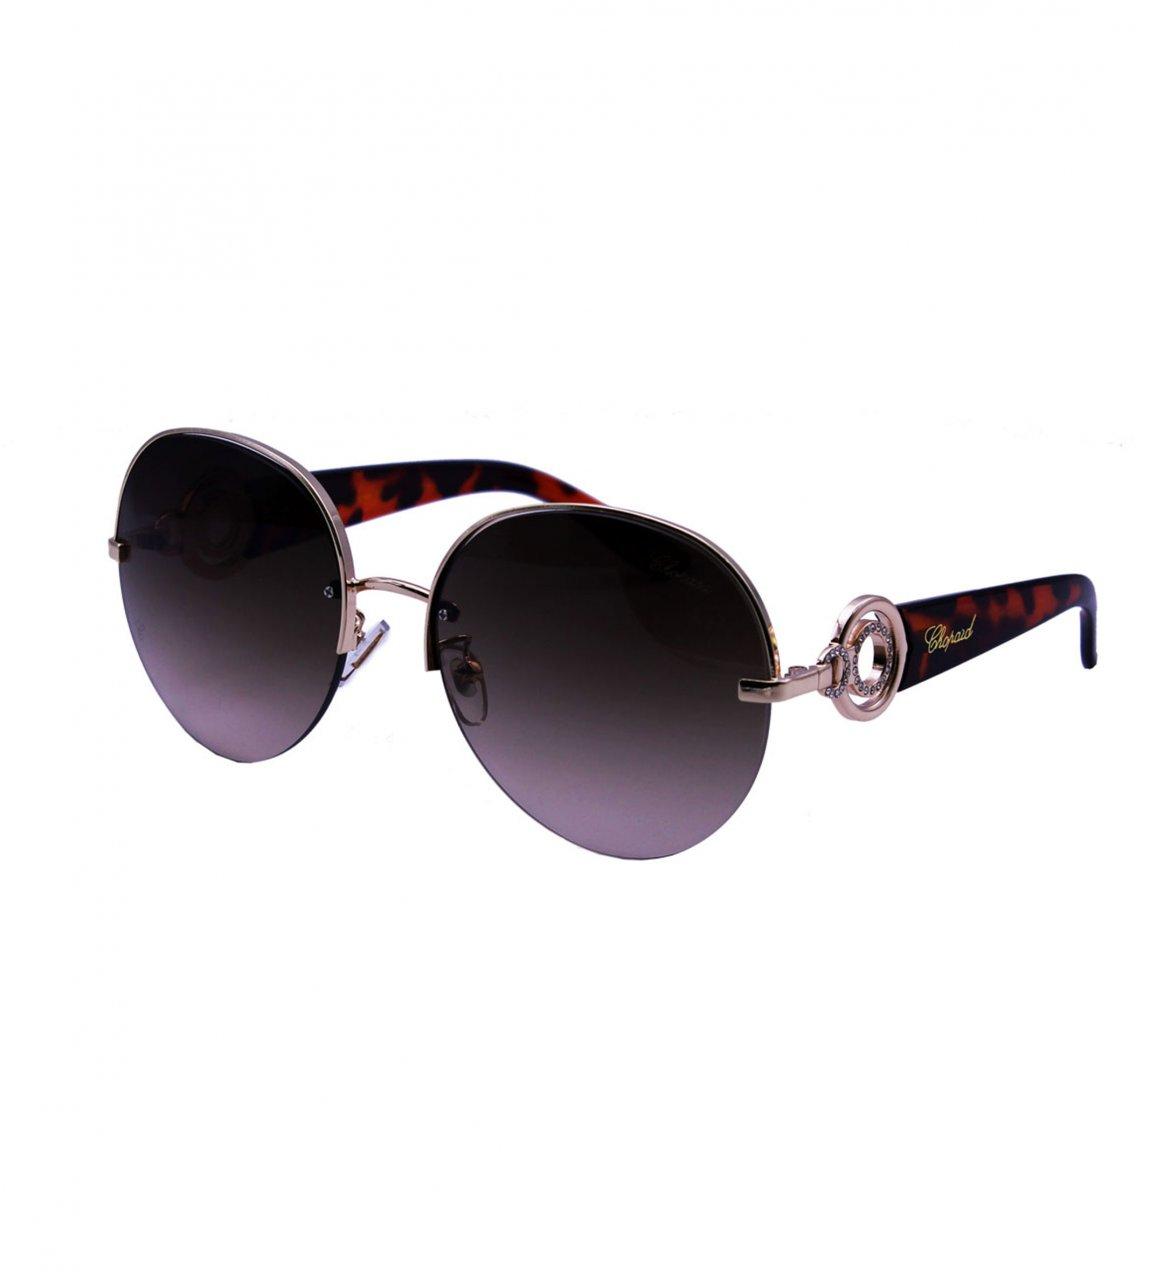 عینک های کپی chopard مدل 8019